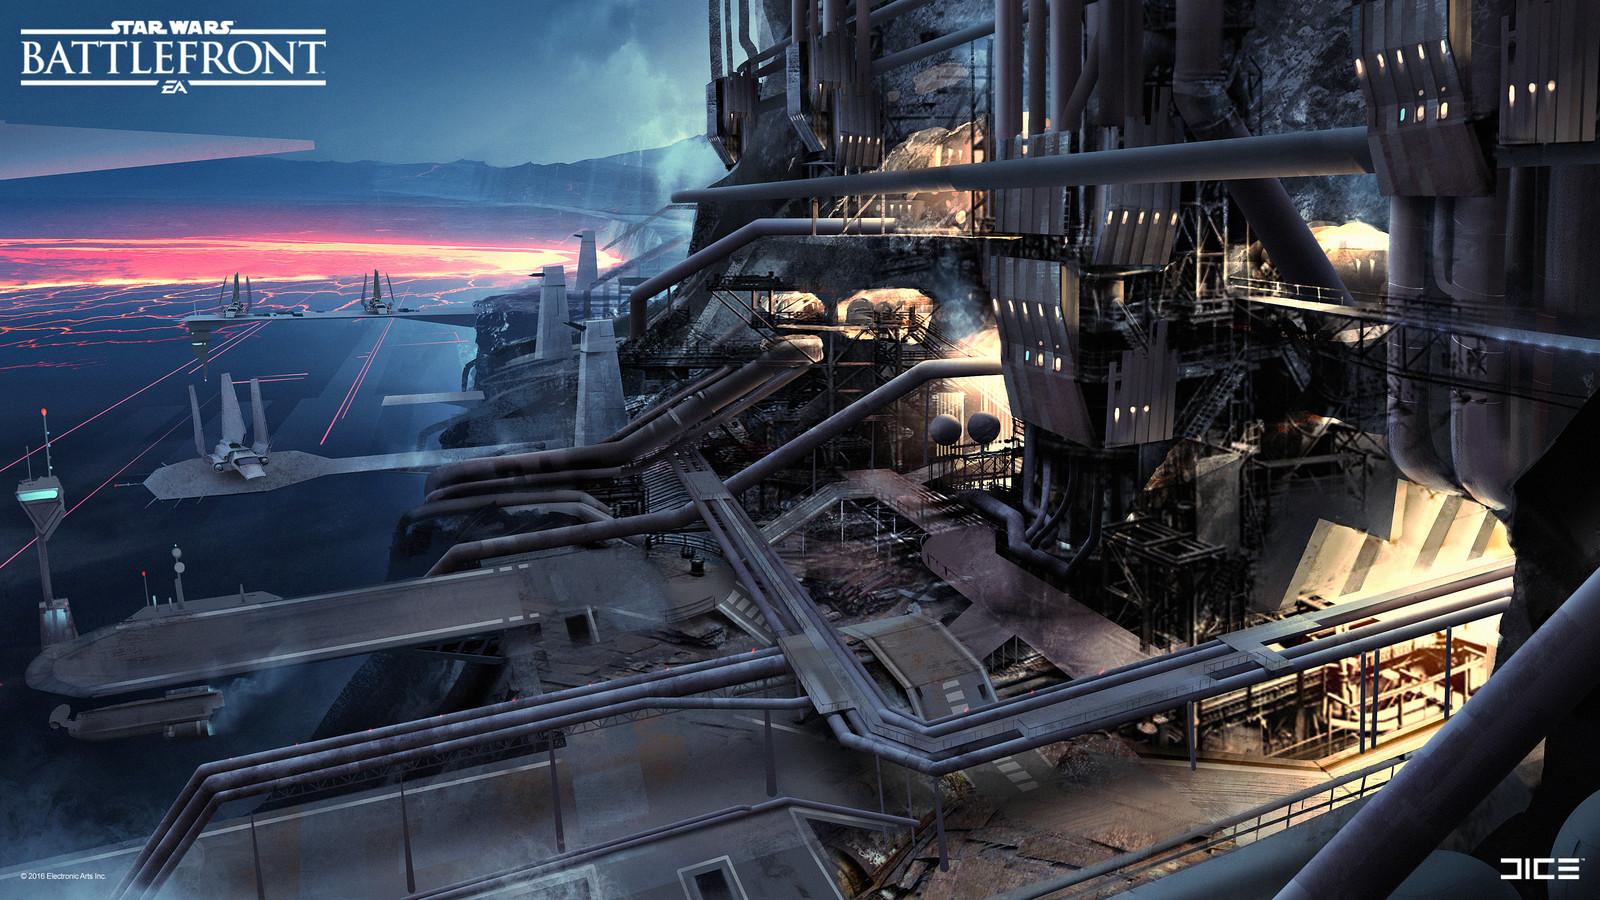 SoroSuub Factory Concept Art  for the Star Wars Battlefront Outer Rim DLC. (2015)